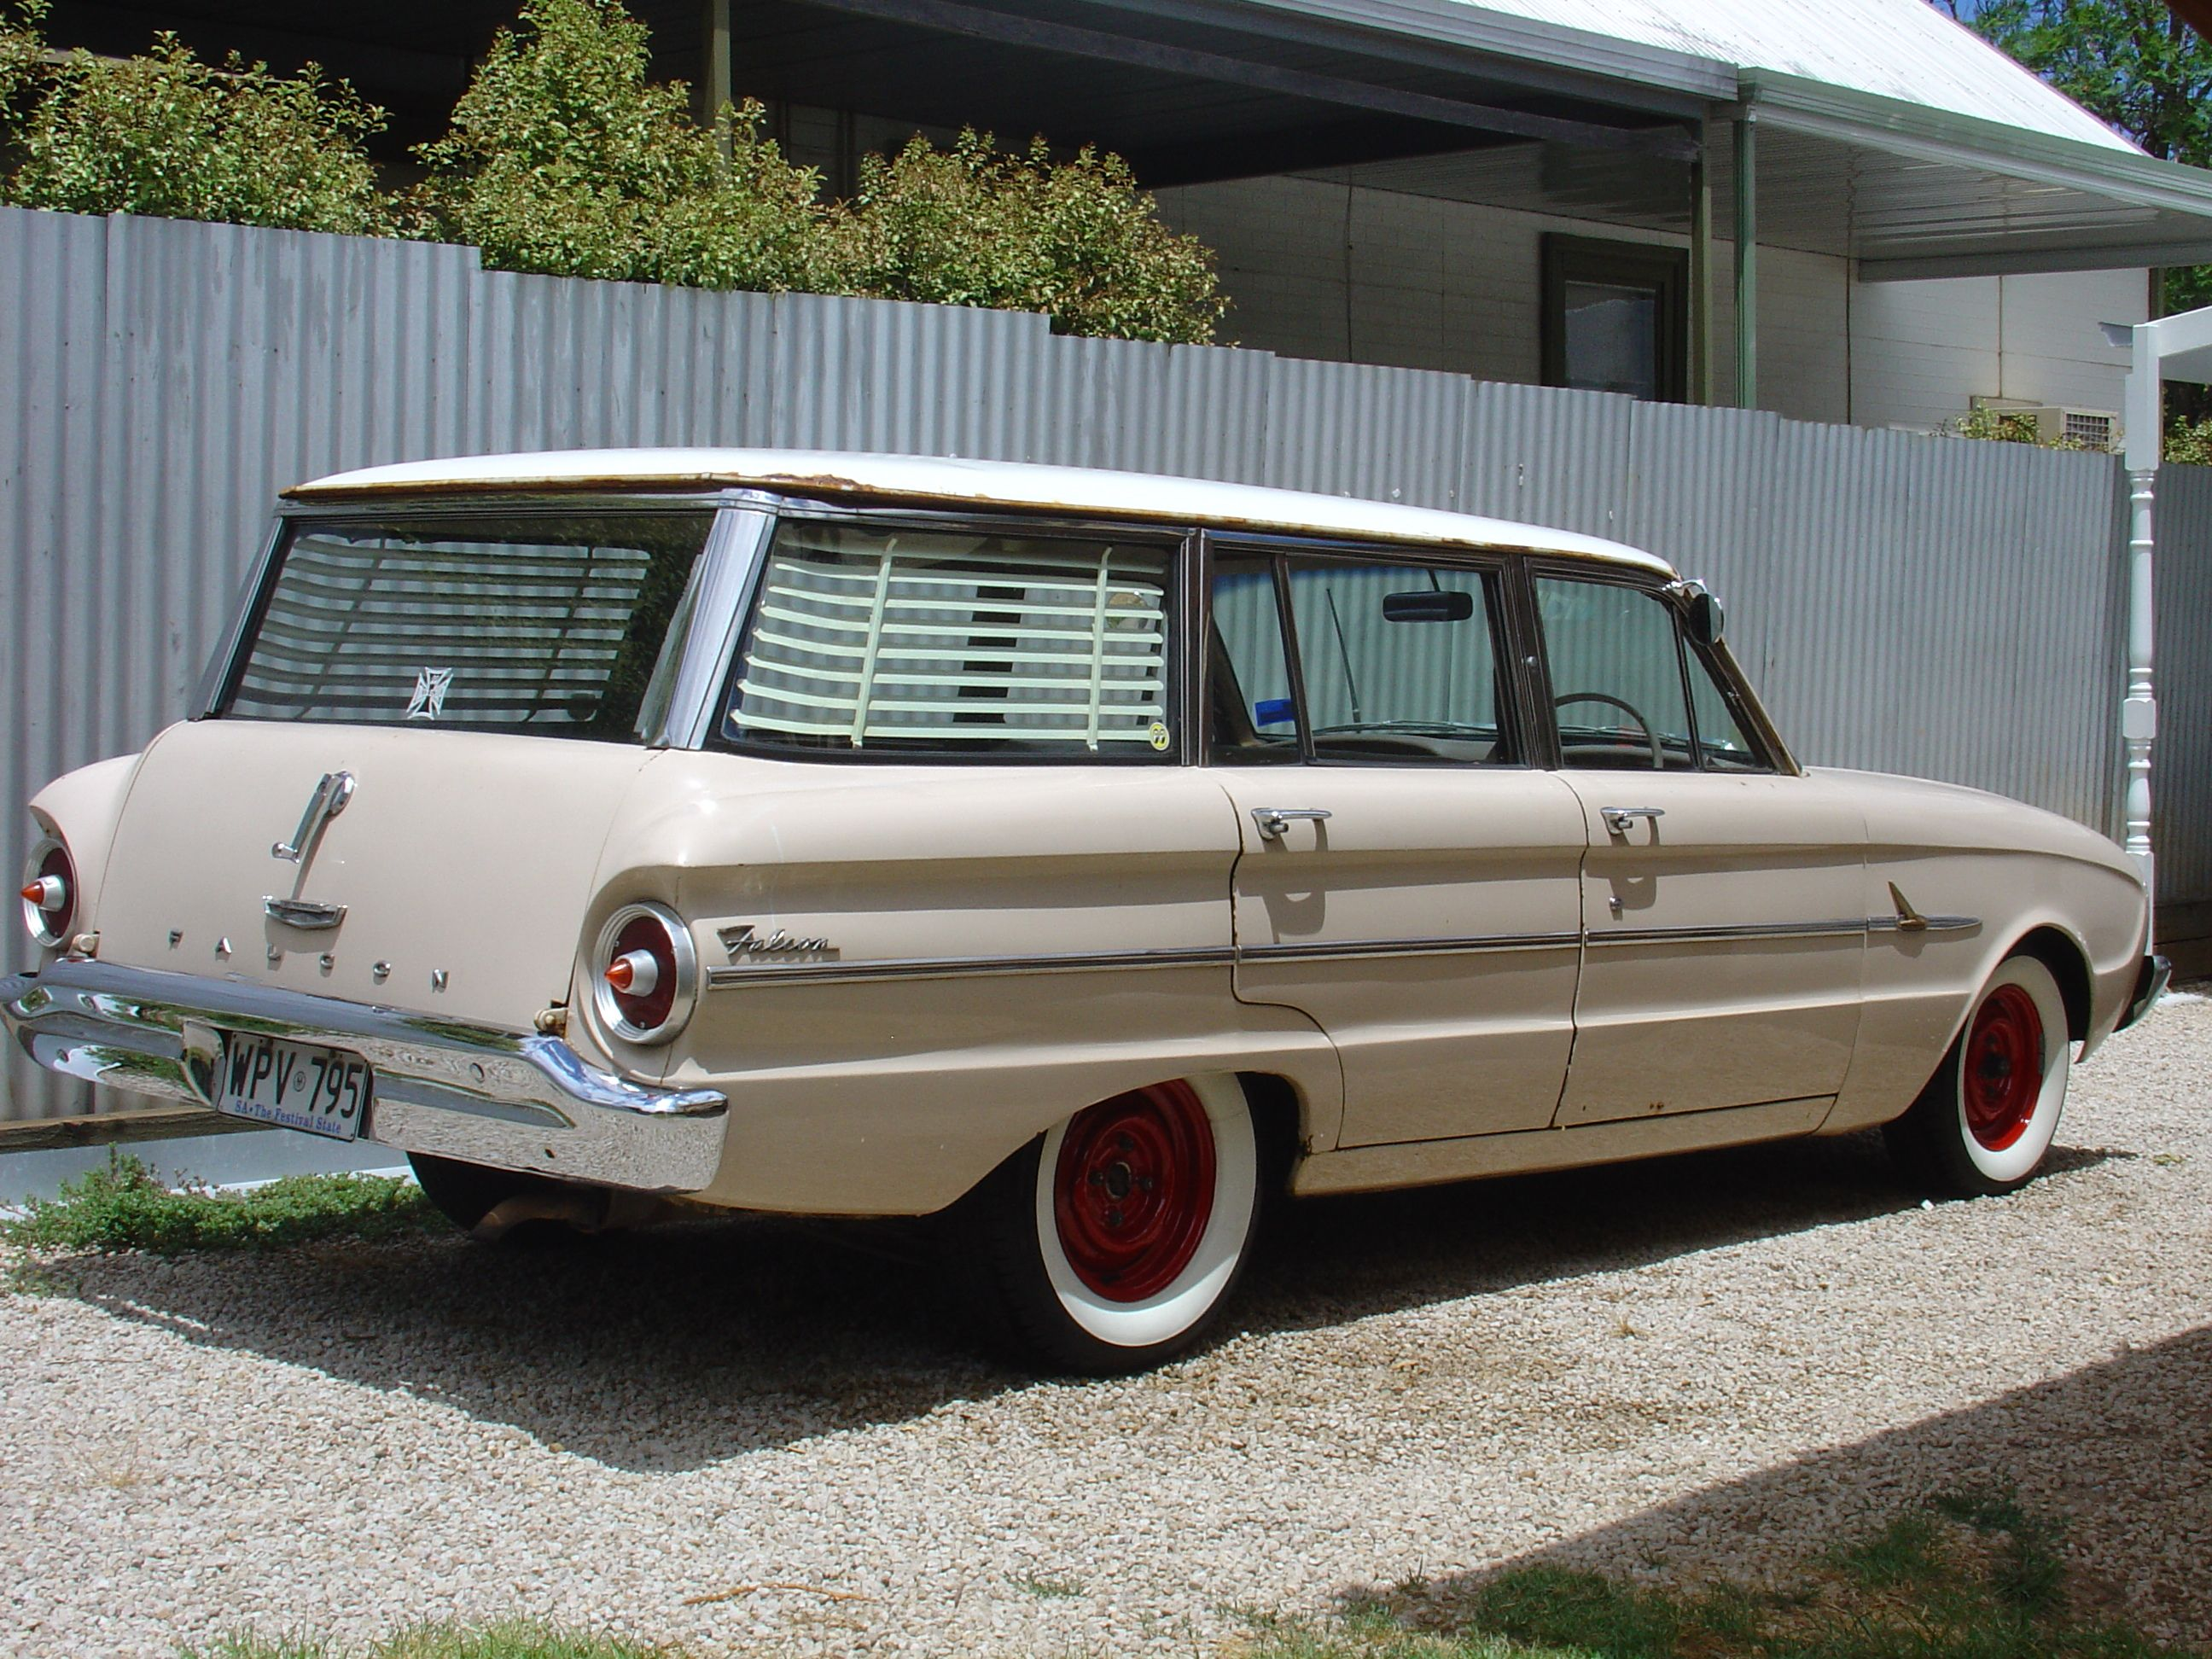 Australian 1963 Ford Falcon Wagon Ford Falcon Station Wagon